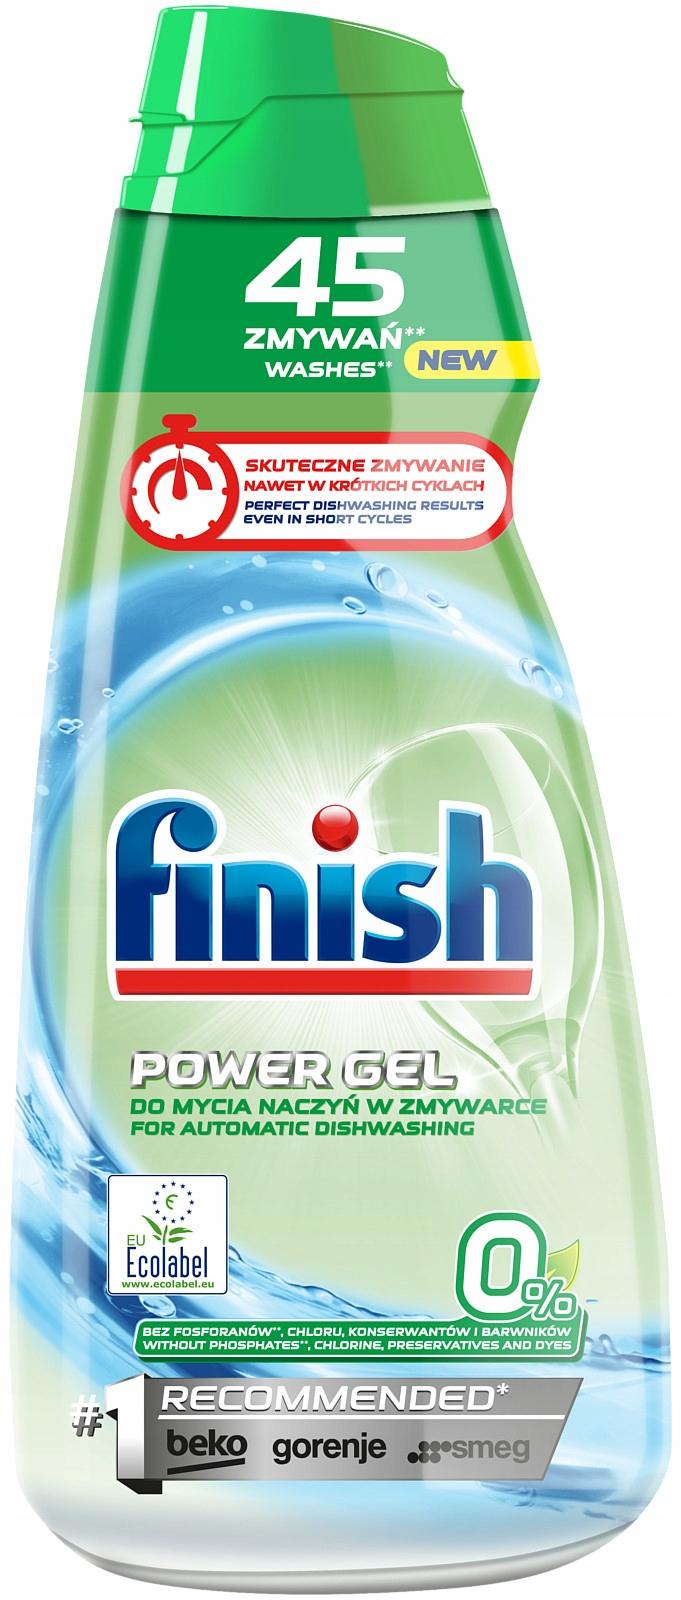 Finish All-in-1 MAX Żel Zmywarki 900ml 45 Zero 0%